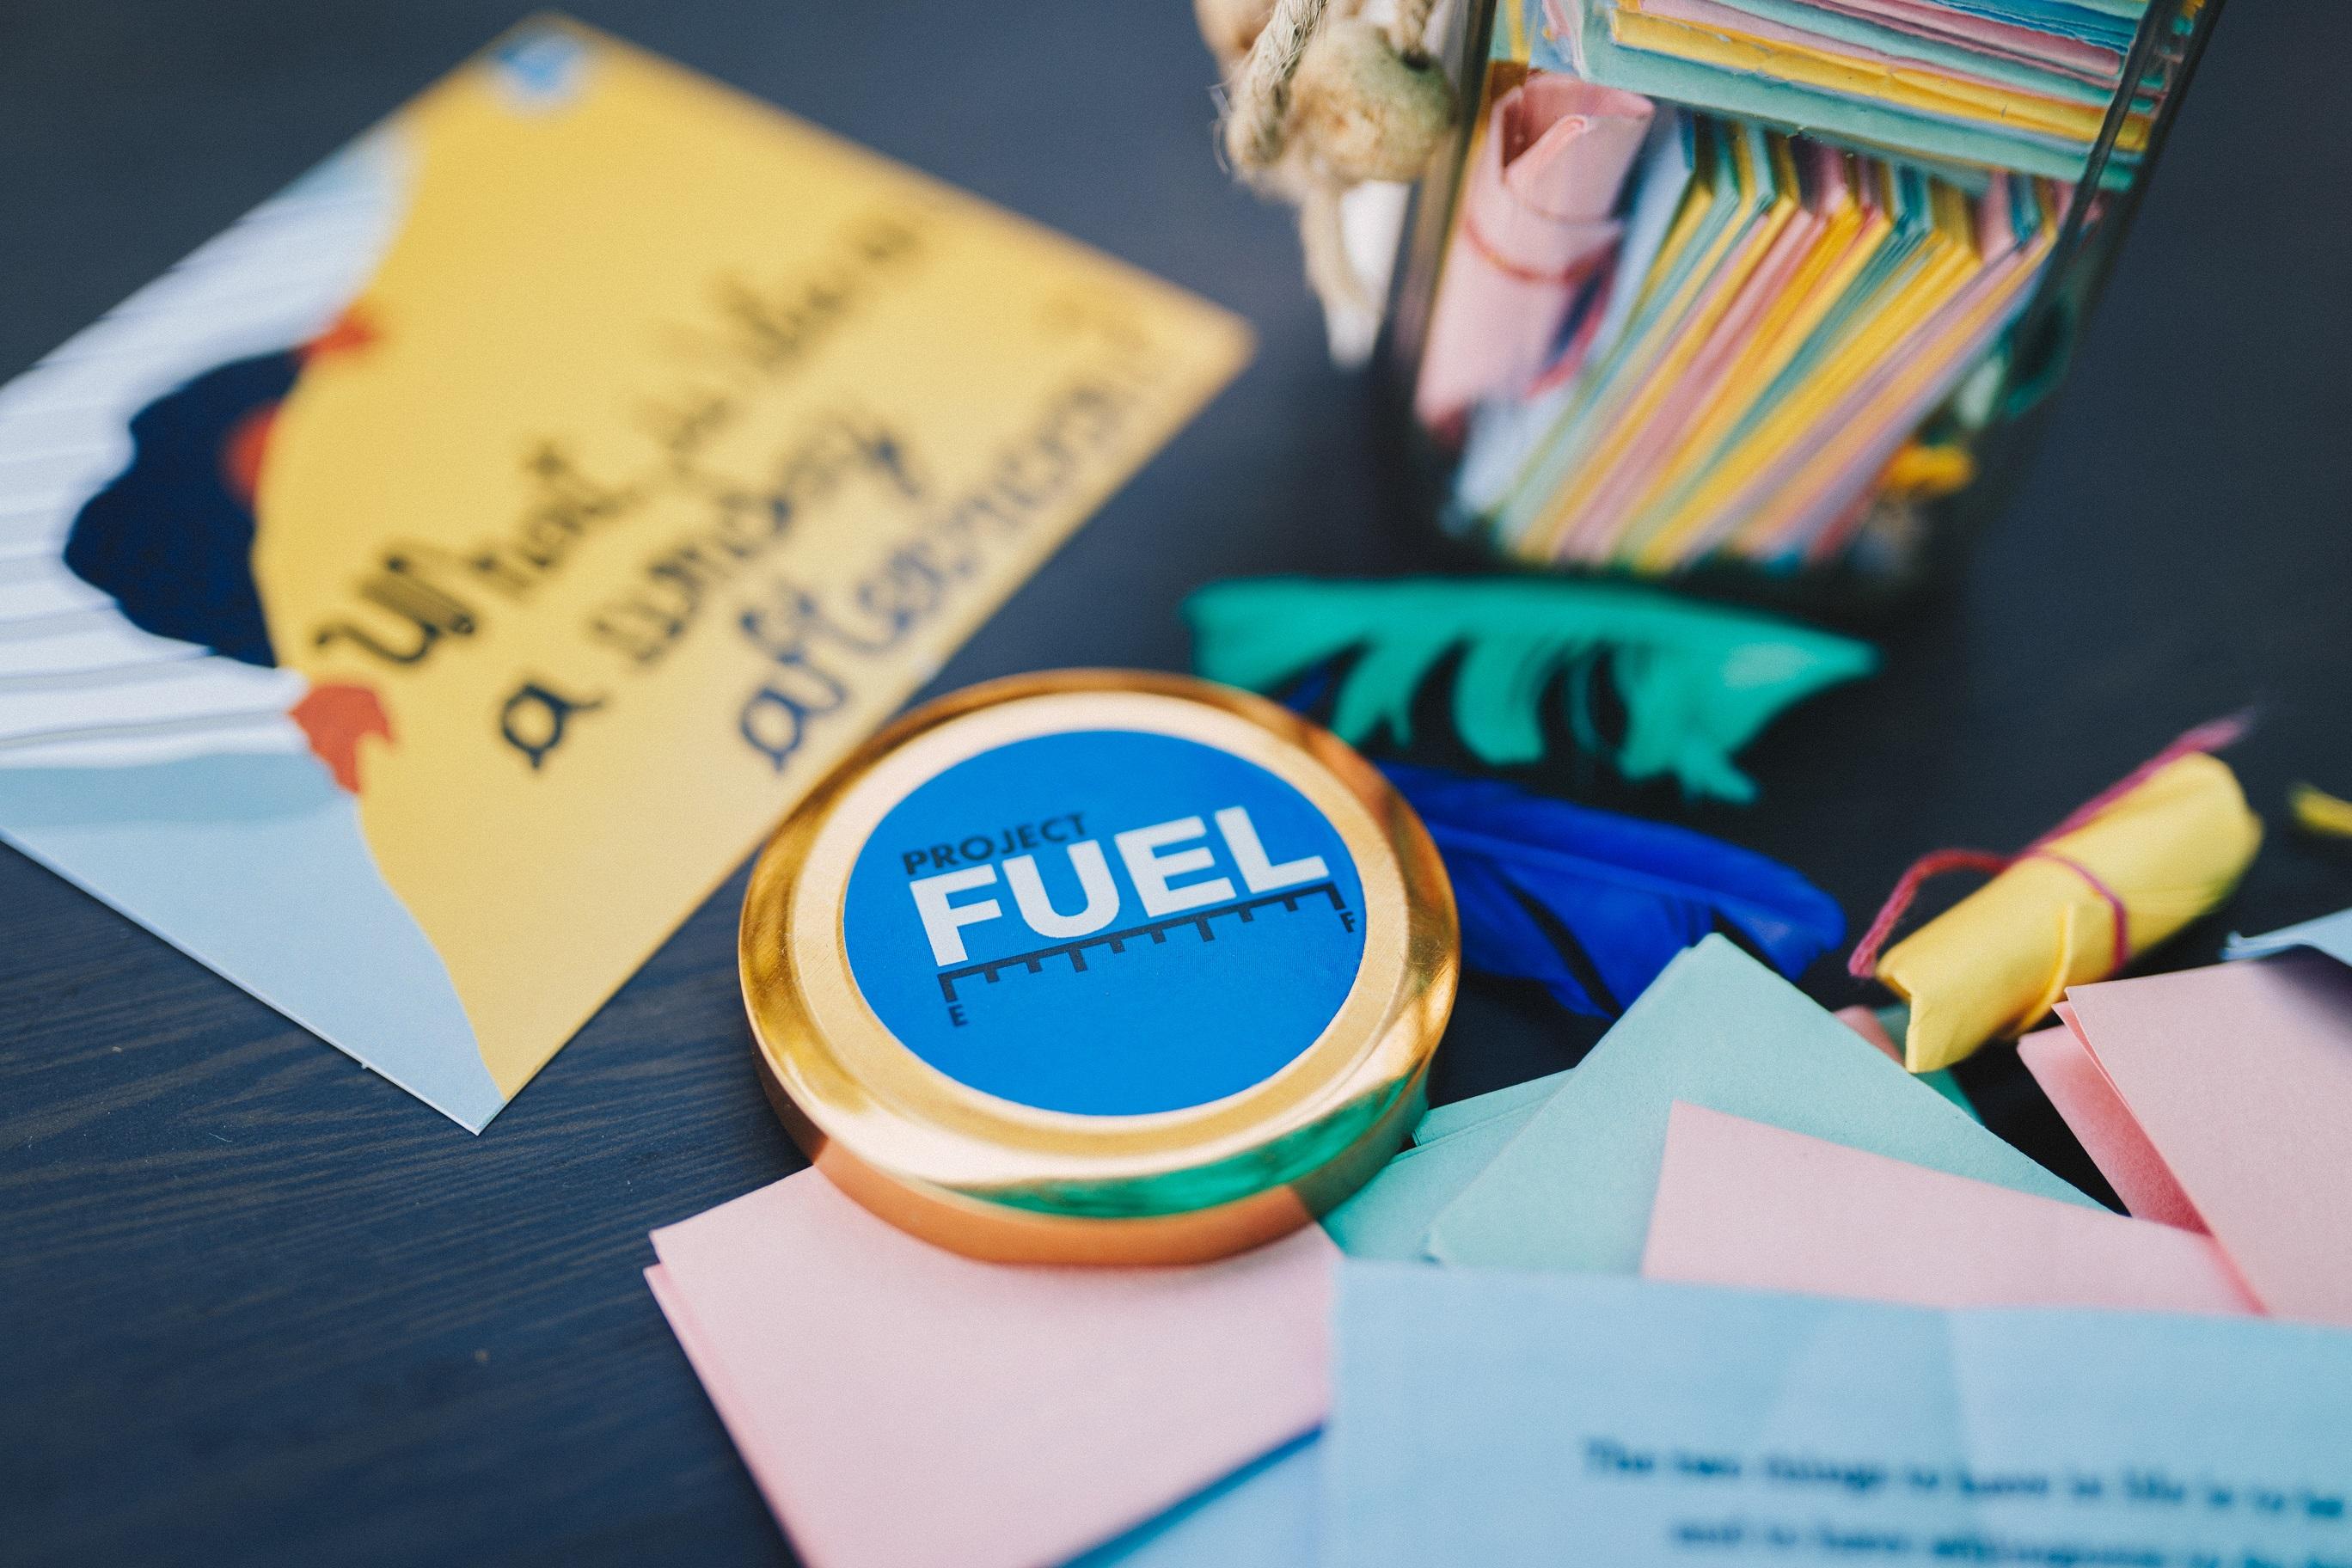 life lessons jar, Adult journal, student journal, Project FUEL journal, ProjectFUEL jar, Deepak ramola